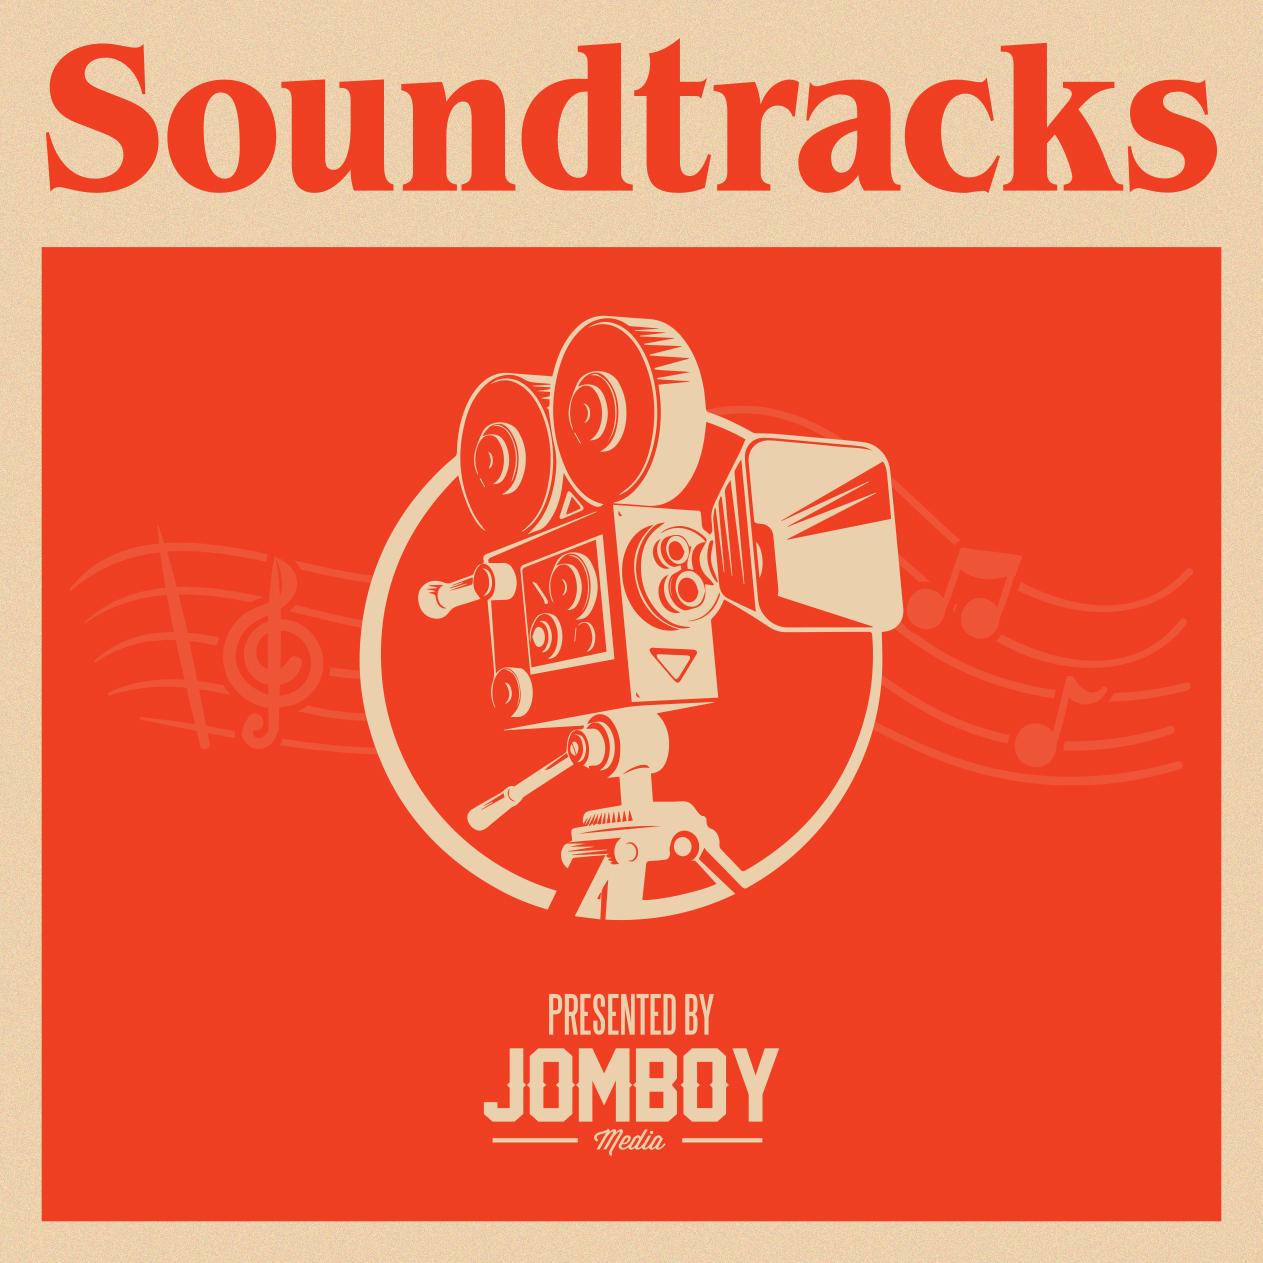 Jomboy Soundtracks logo